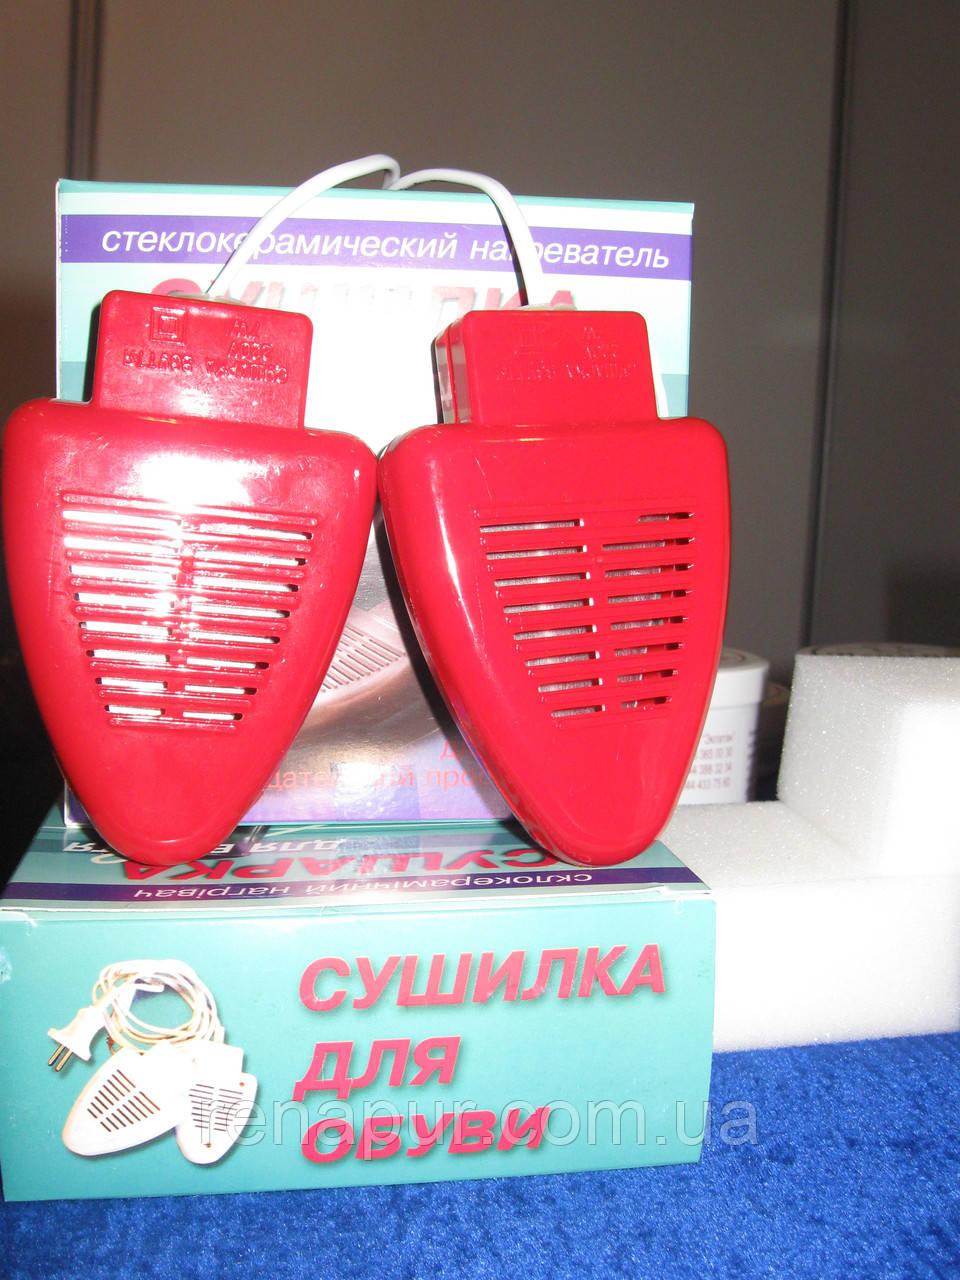 Сушилка для обуви 220 V